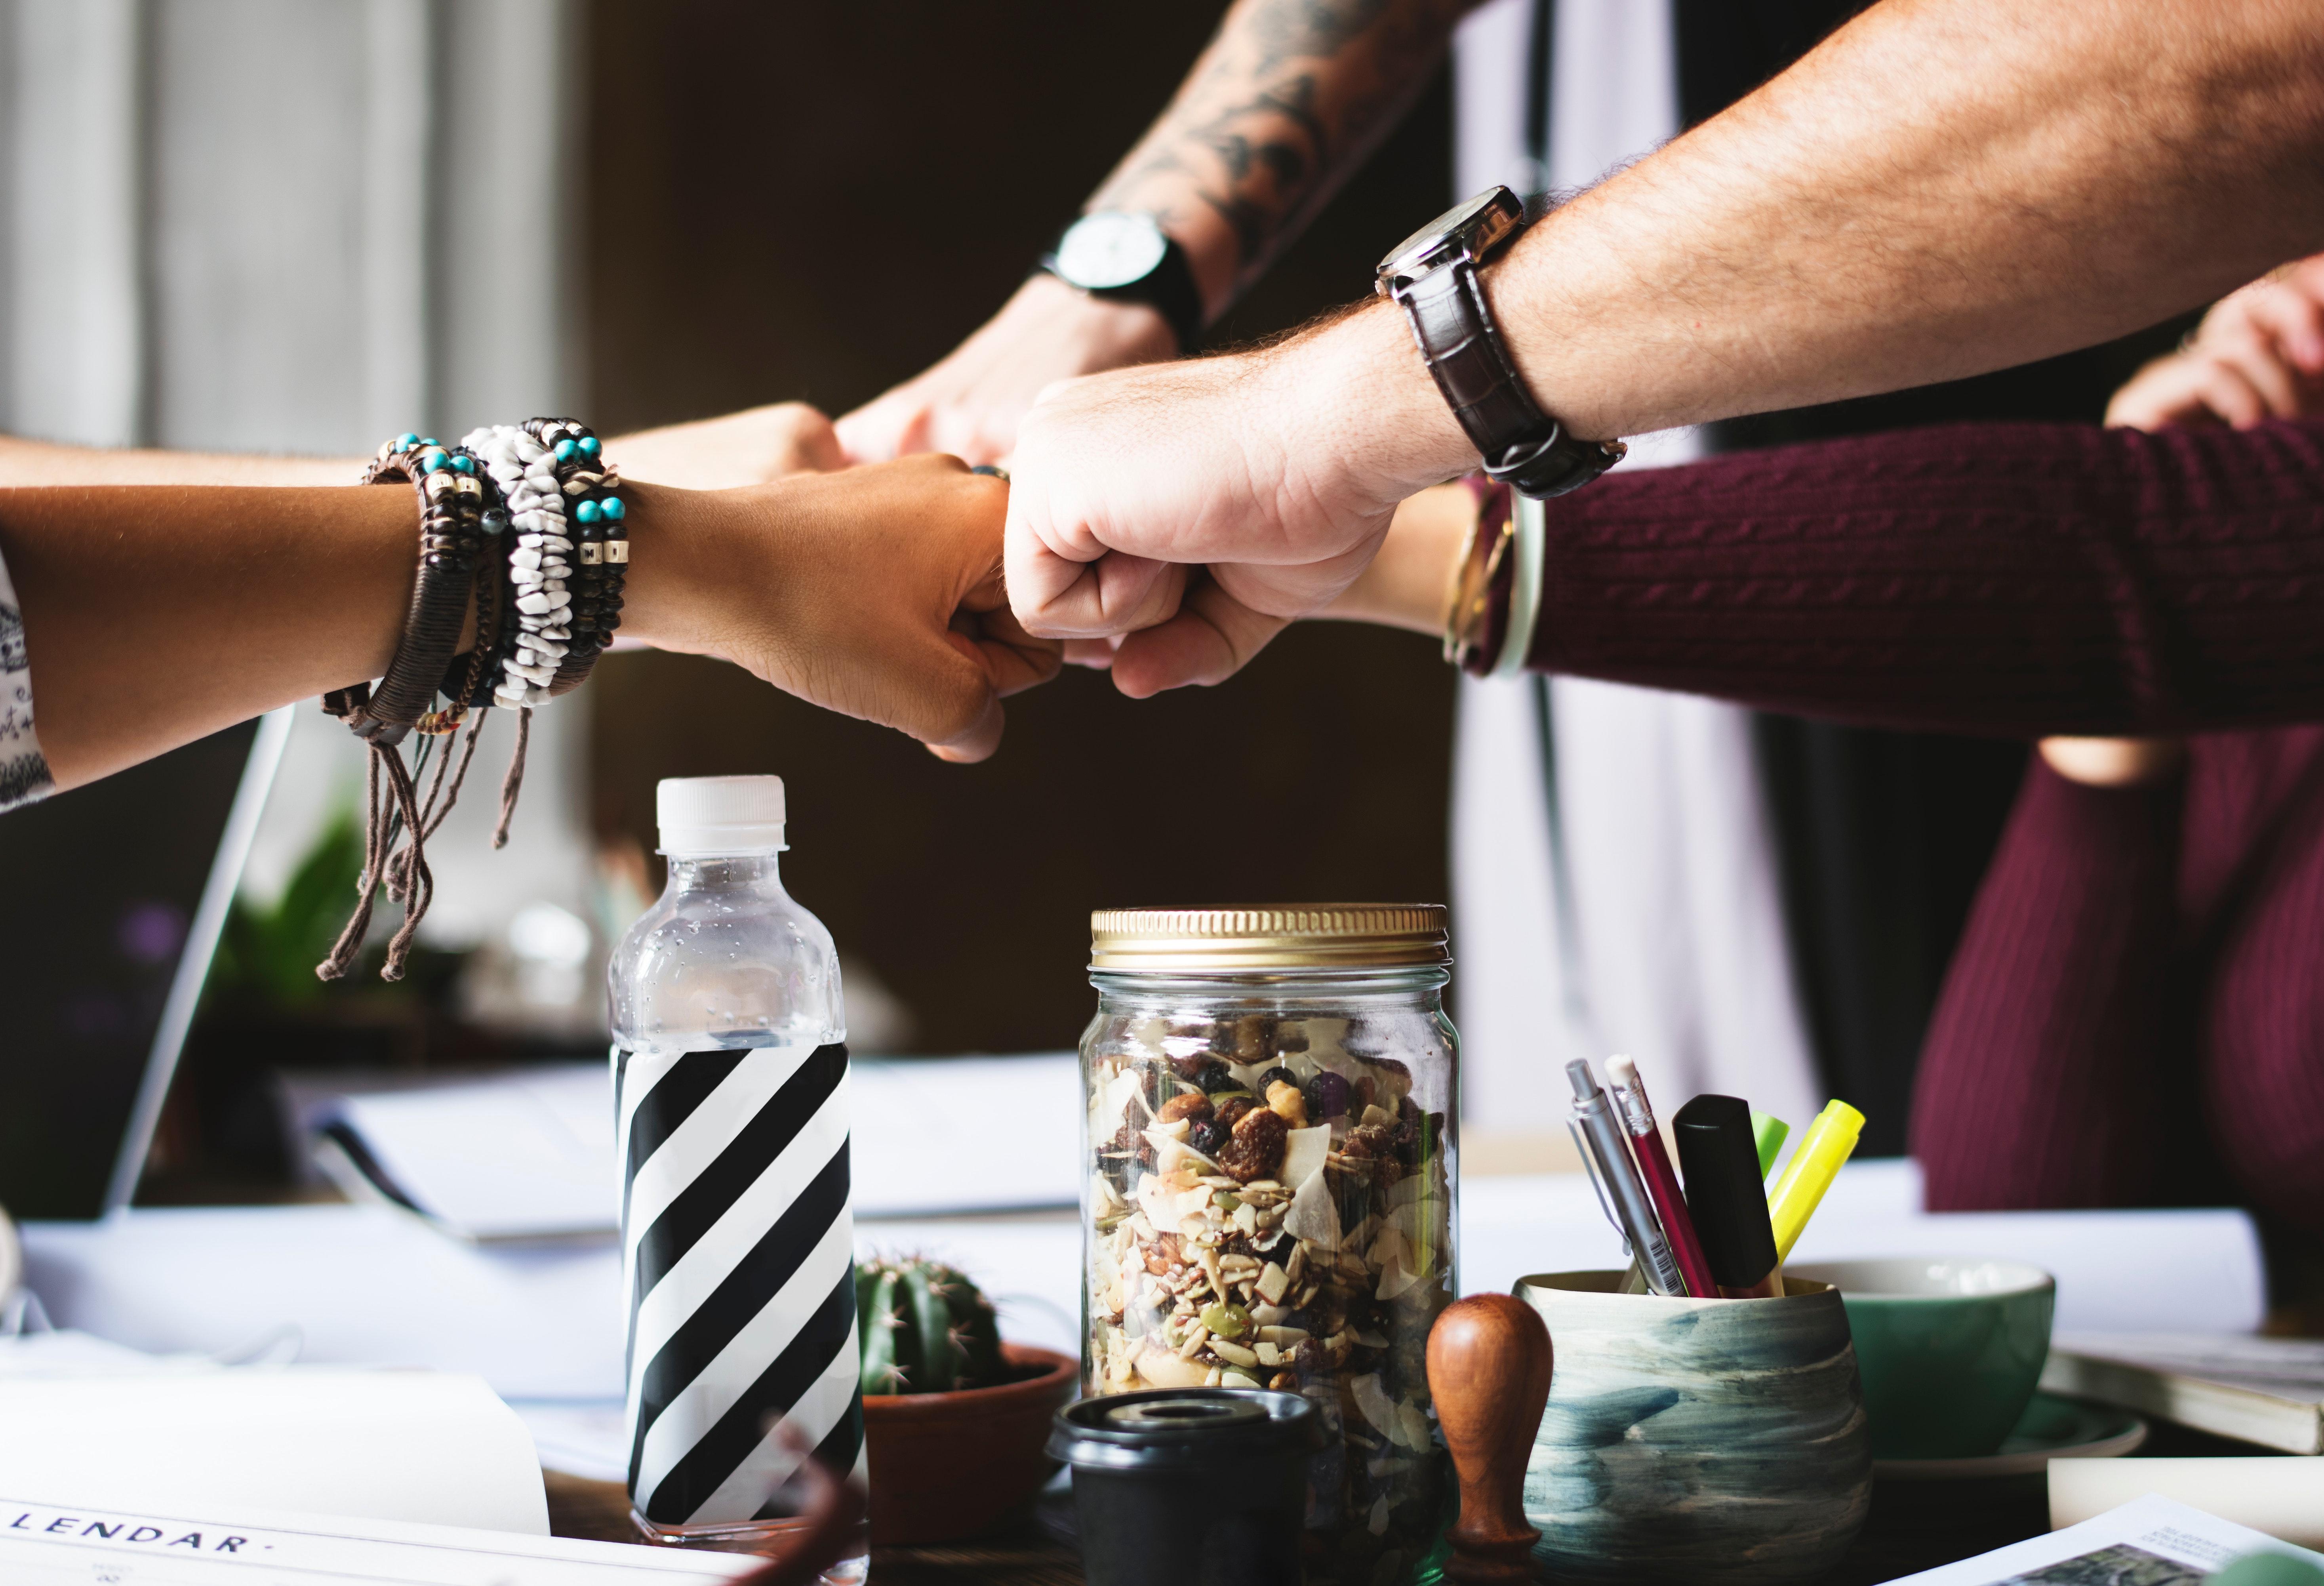 Build a customer community